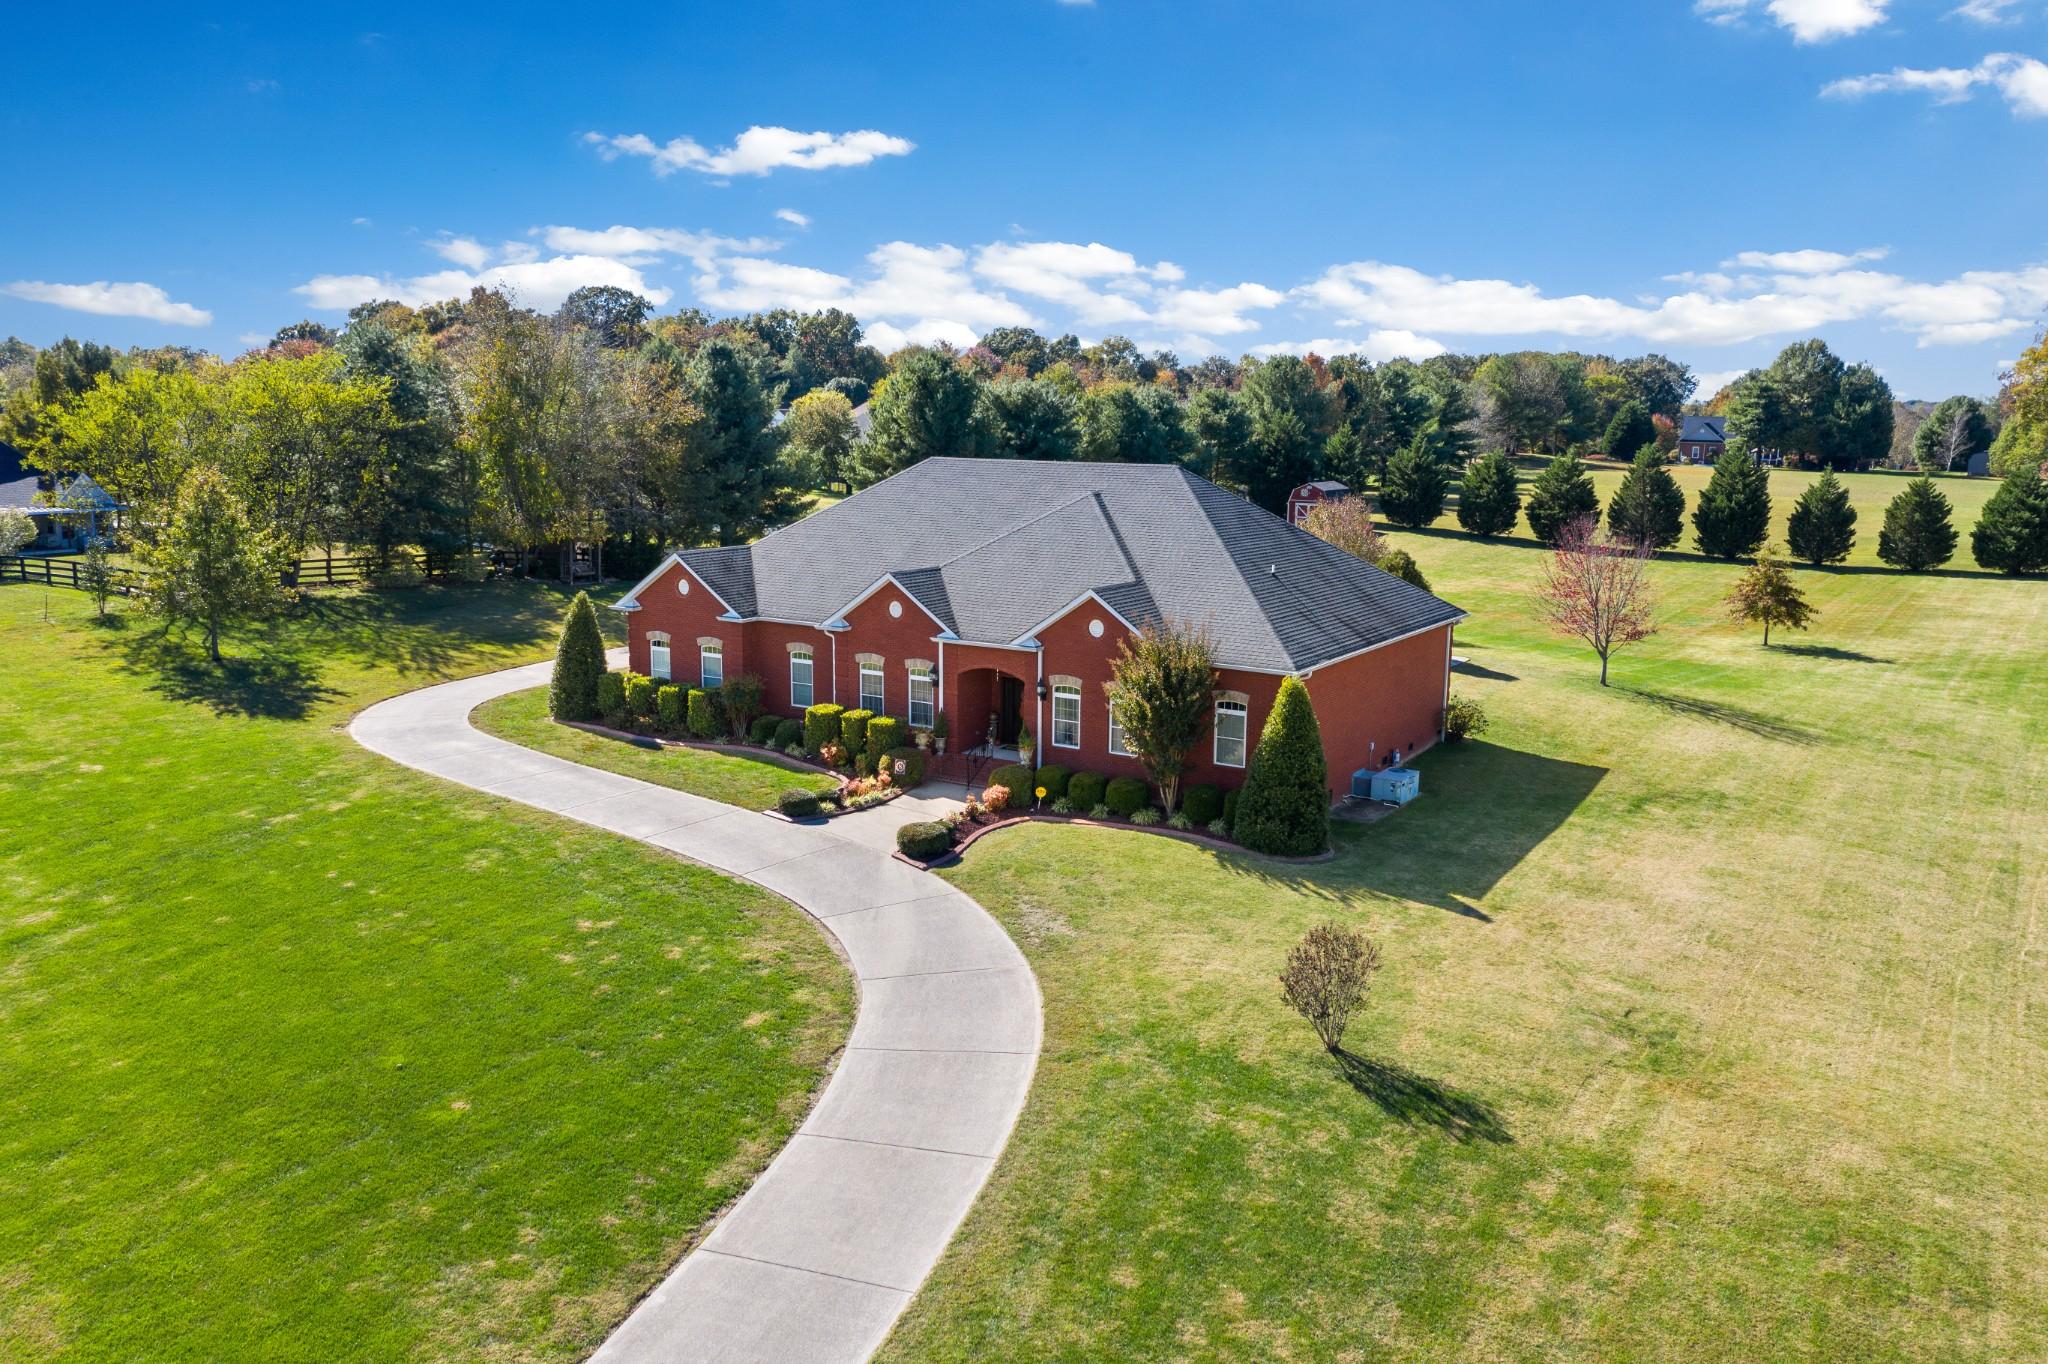 836 Dixie Bee Rd, Adams, TN 37010 - Adams, TN real estate listing